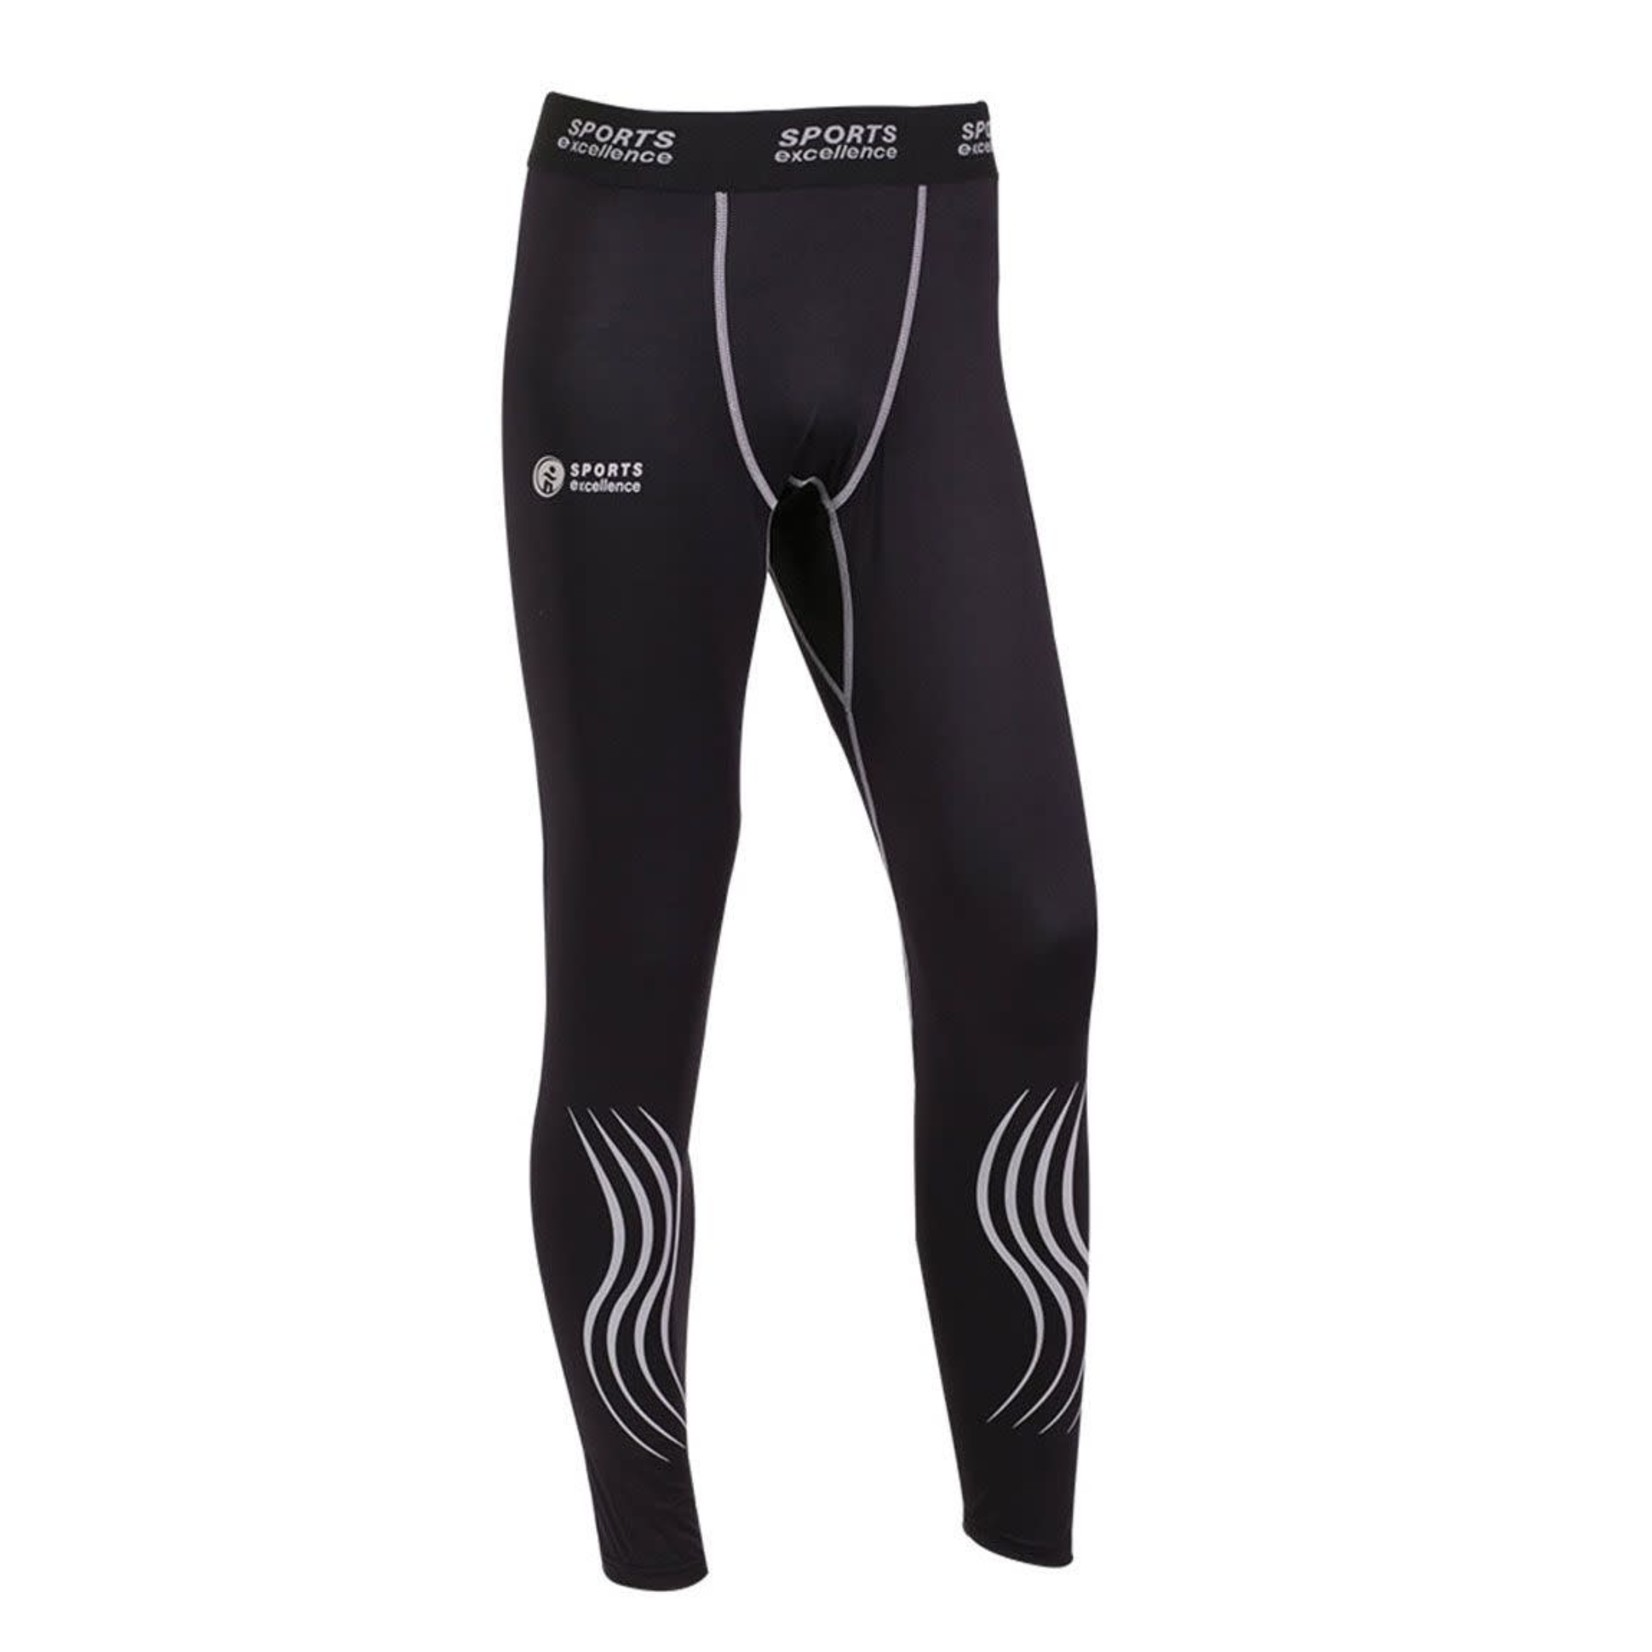 Sports Excellence SEC Compression Pants, TI50 Gel, Mens